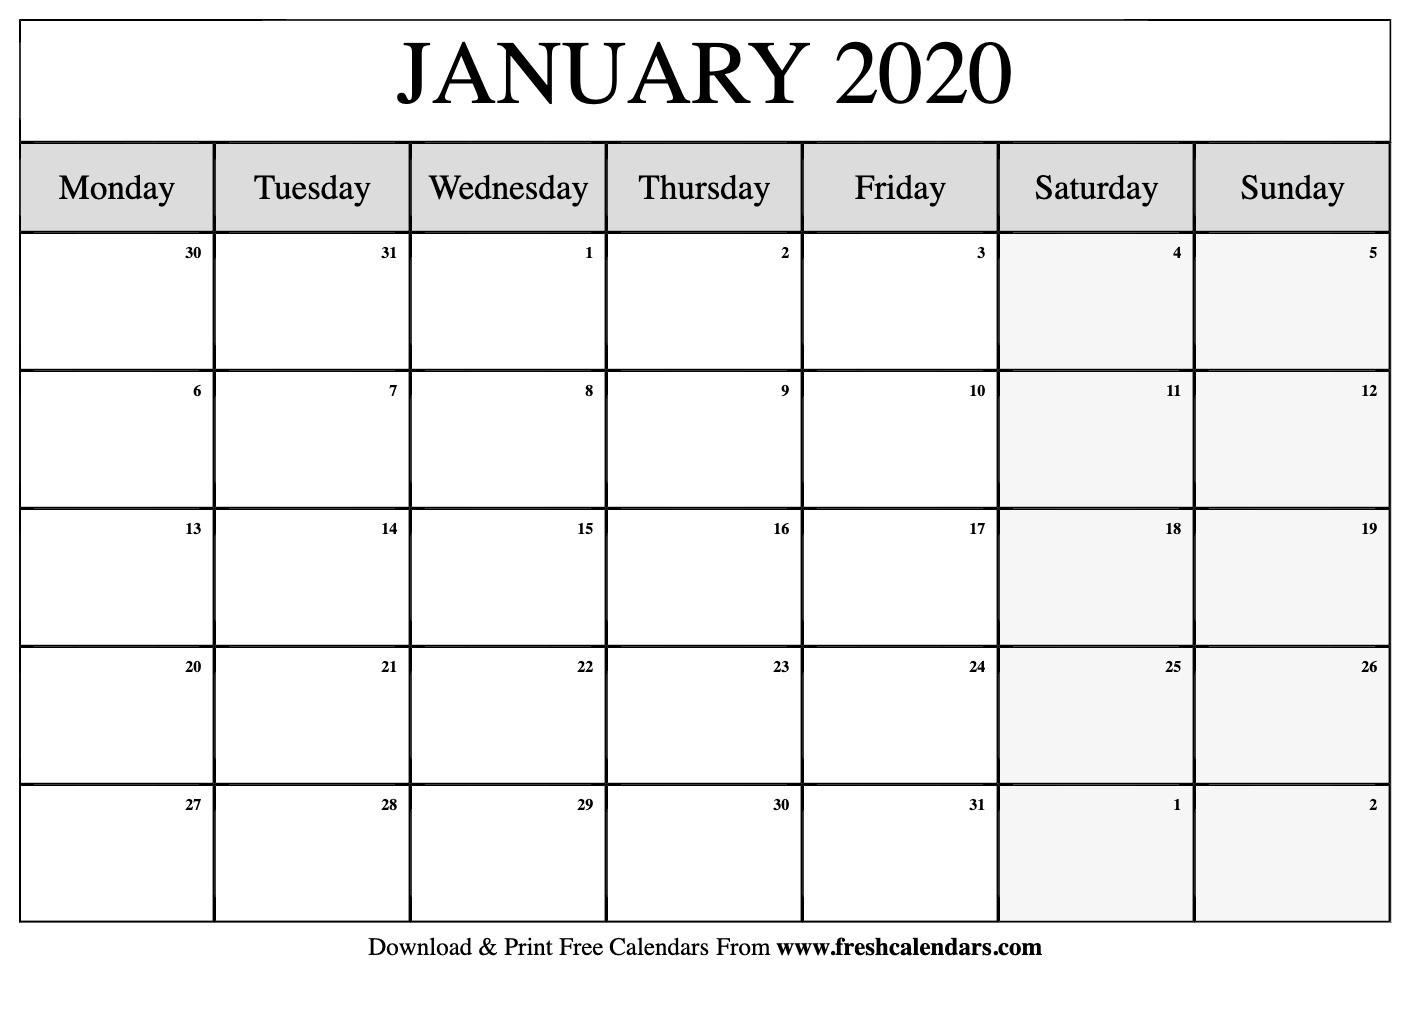 January 2020 Calendar Printable - Fresh Calendars-January 2020 Calendar Monday Start